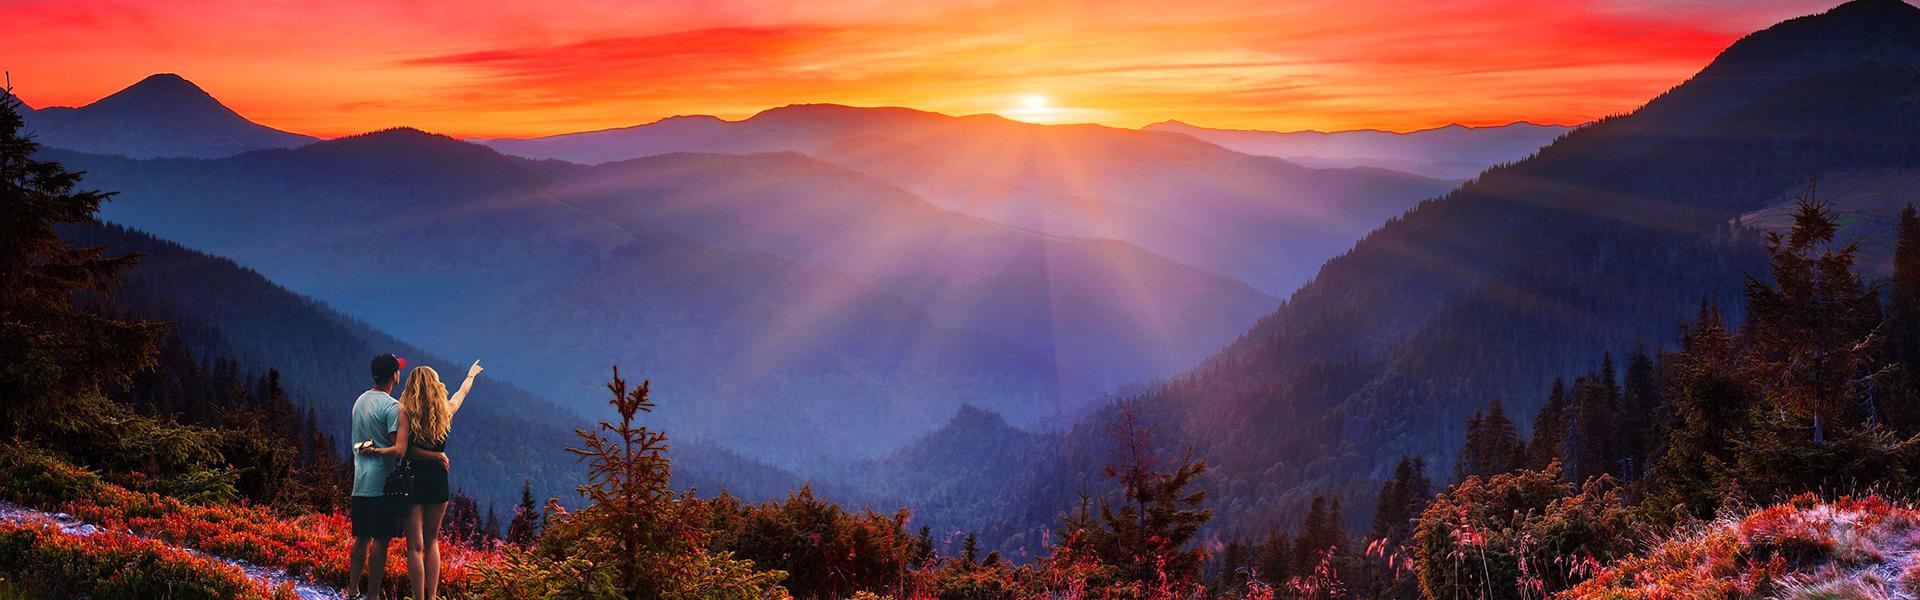 Mountain Sunset Wide